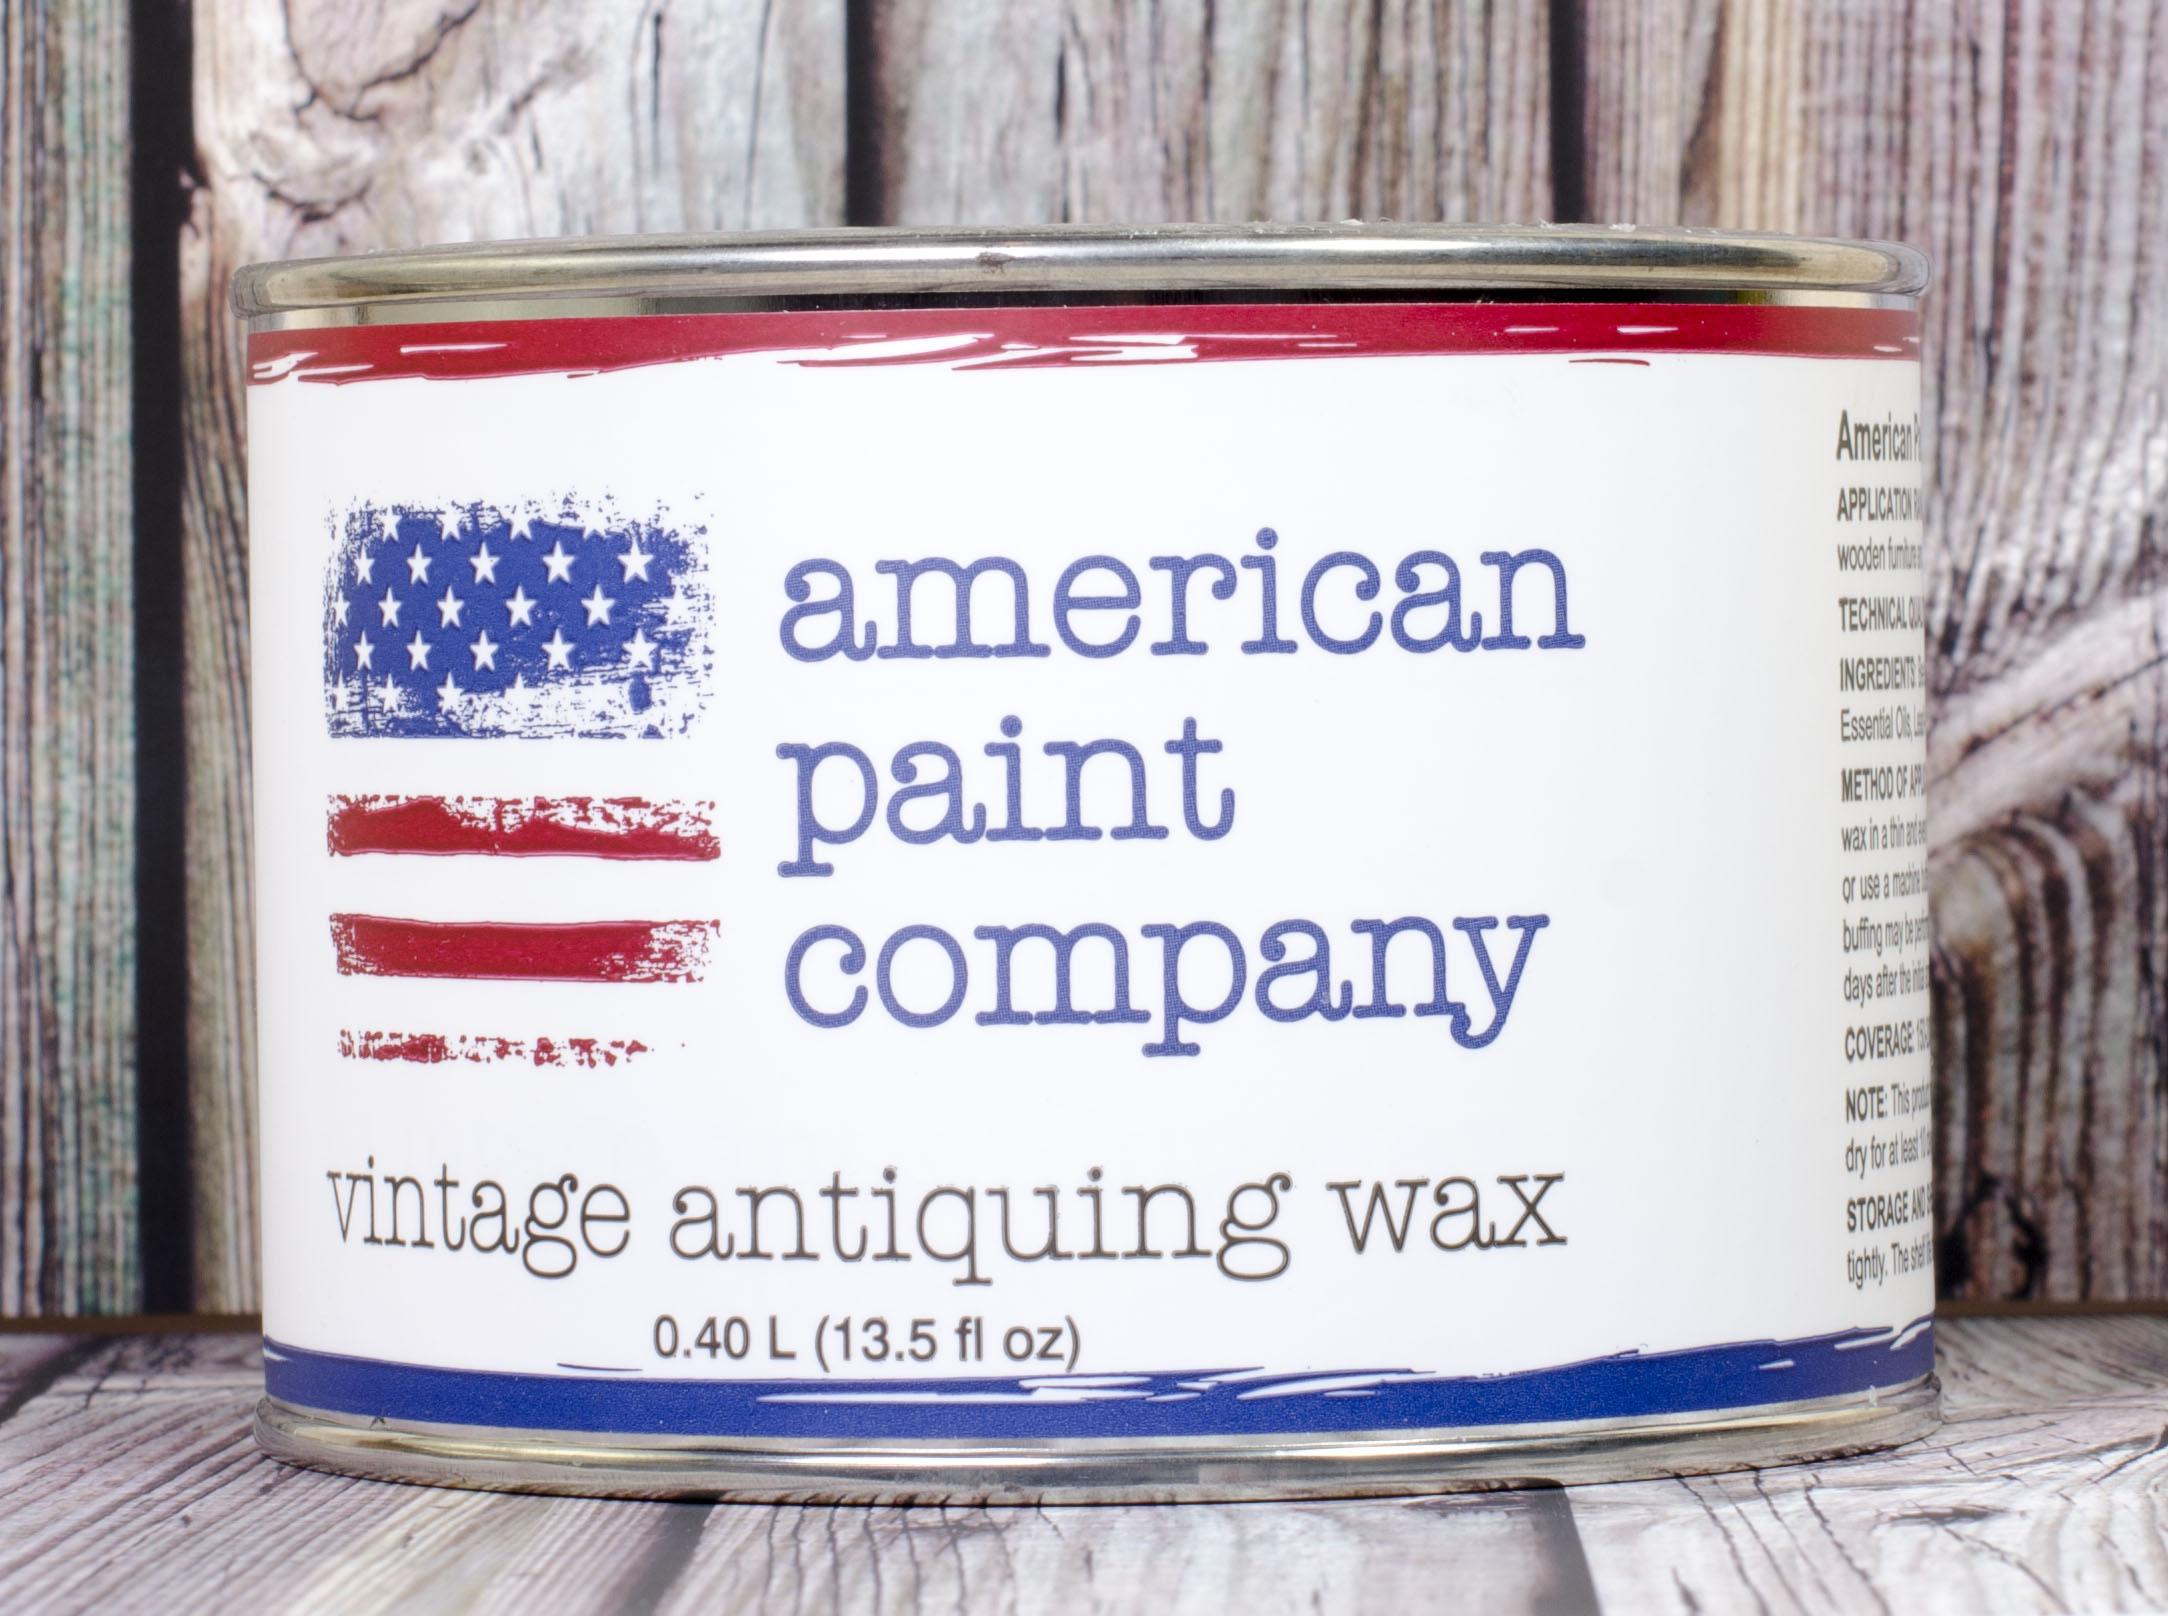 American Paint Company Black Wax